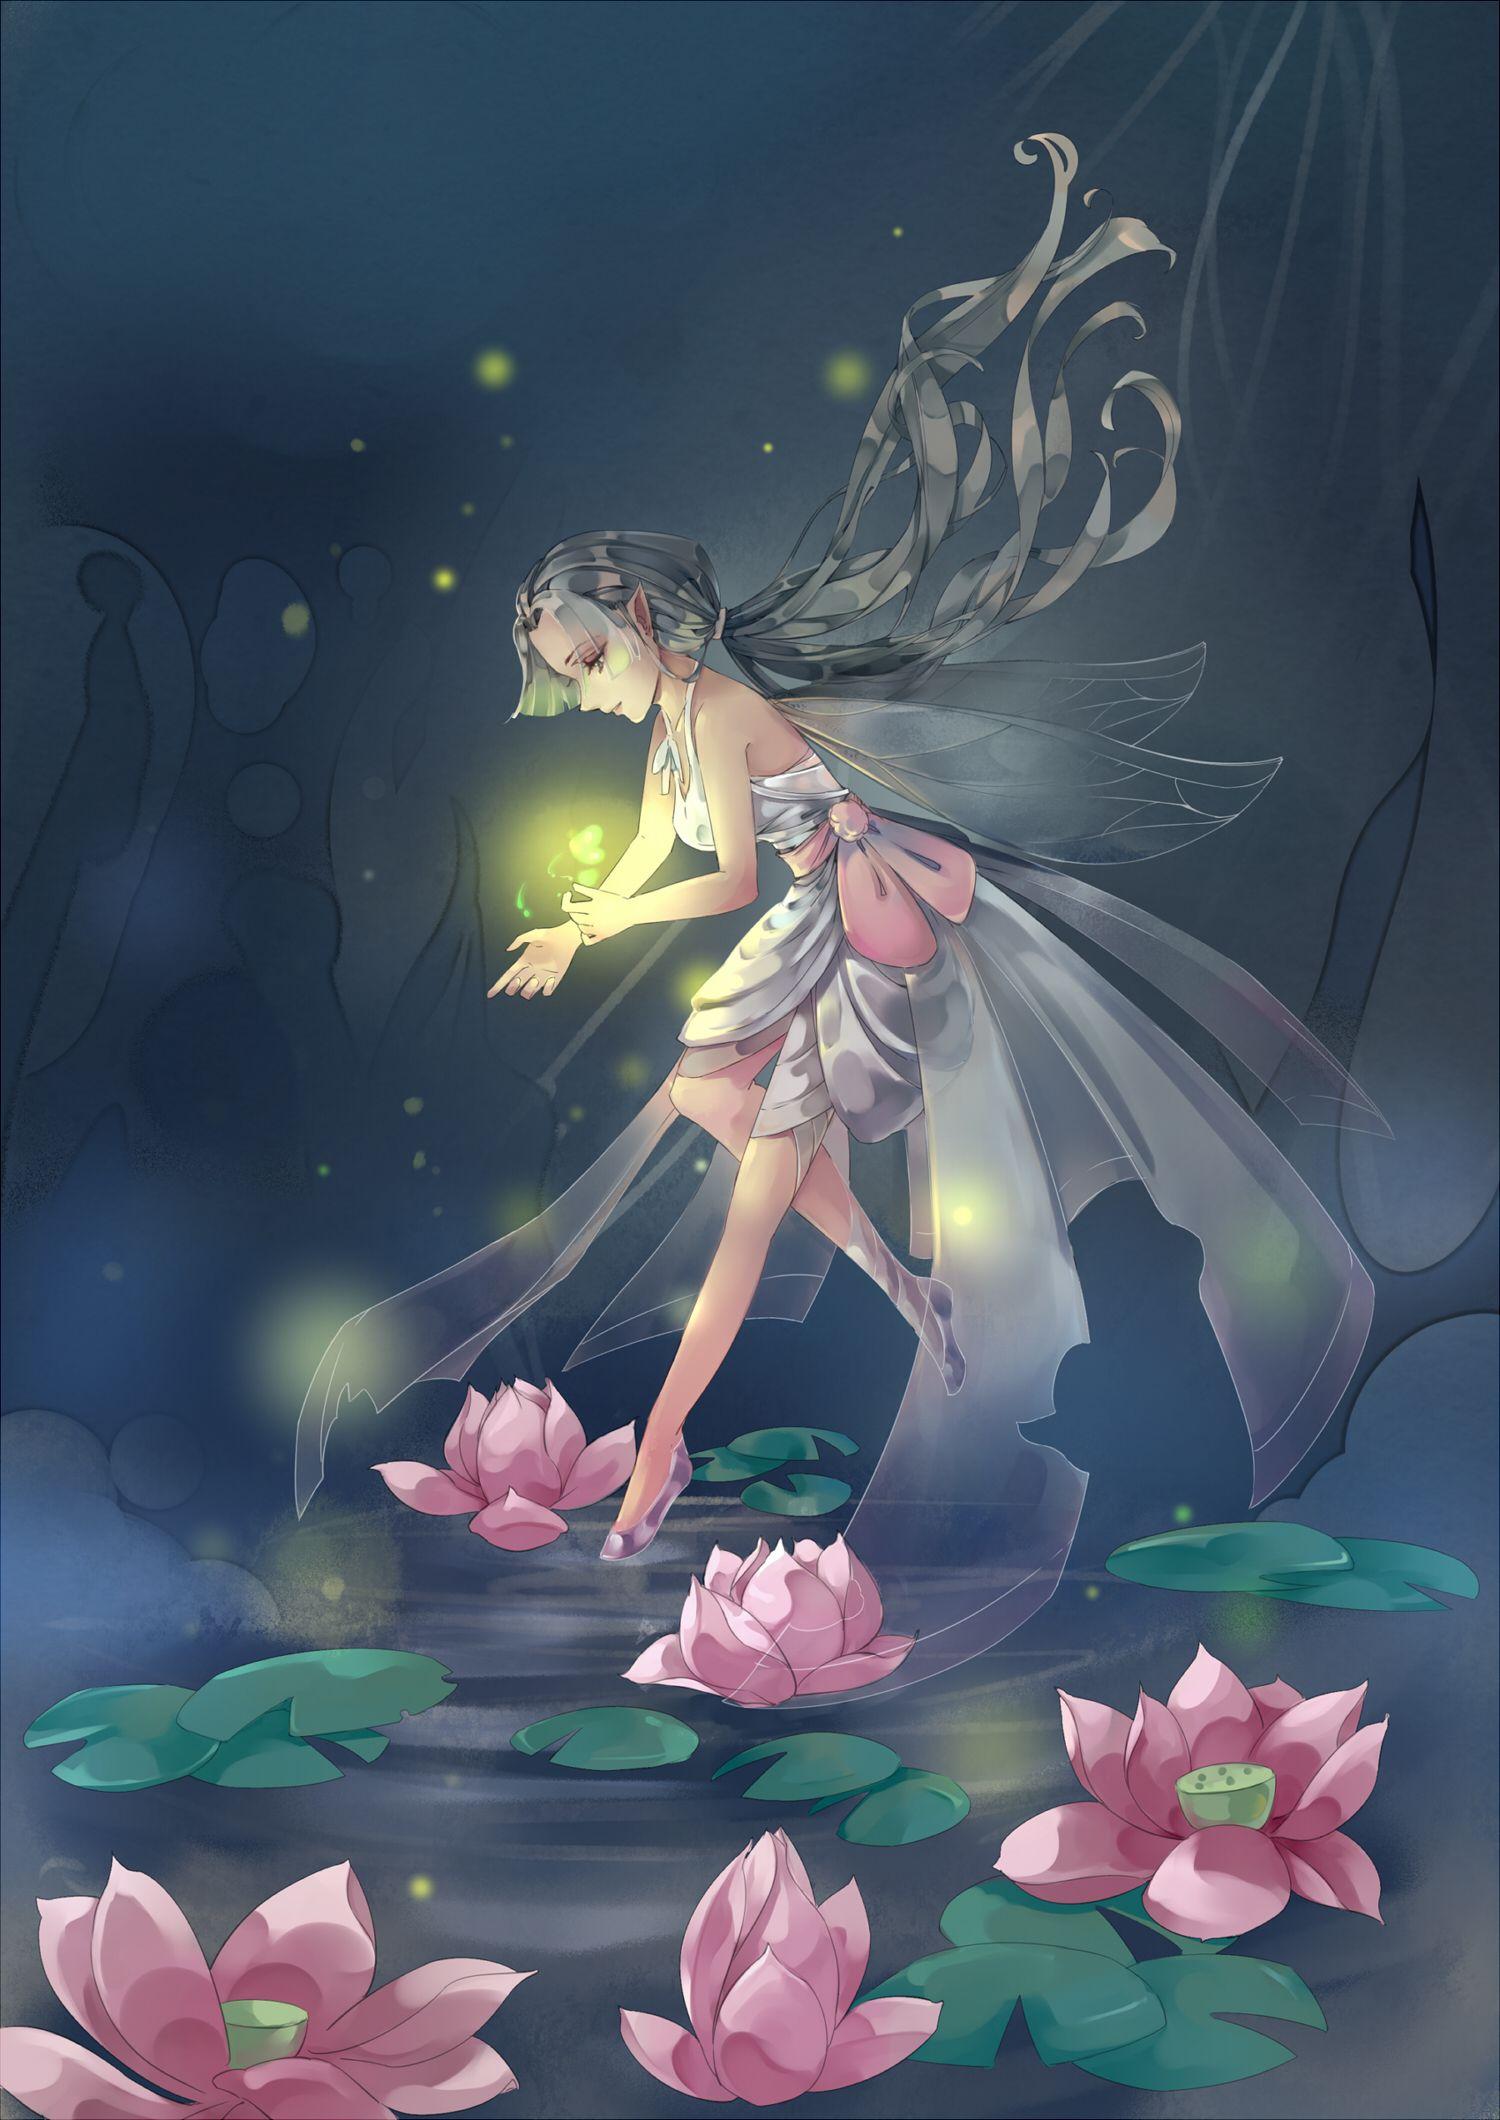 精灵 By 逸雪遥梦涟又 Art, Fantasy art, Anime